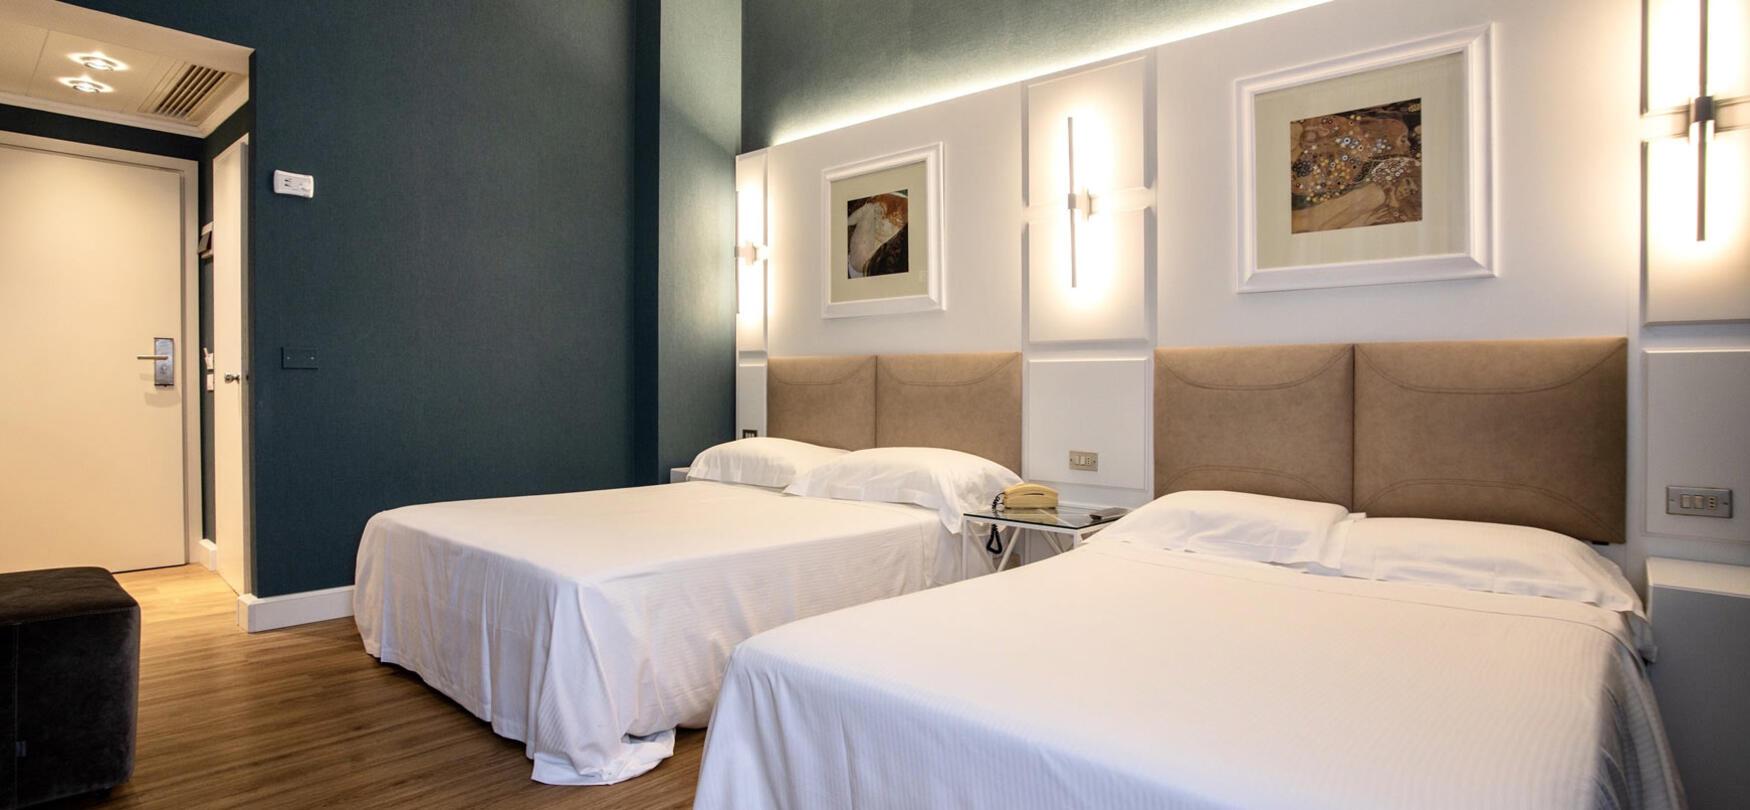 ambienthotels fr chambres-villa-adriatica 004